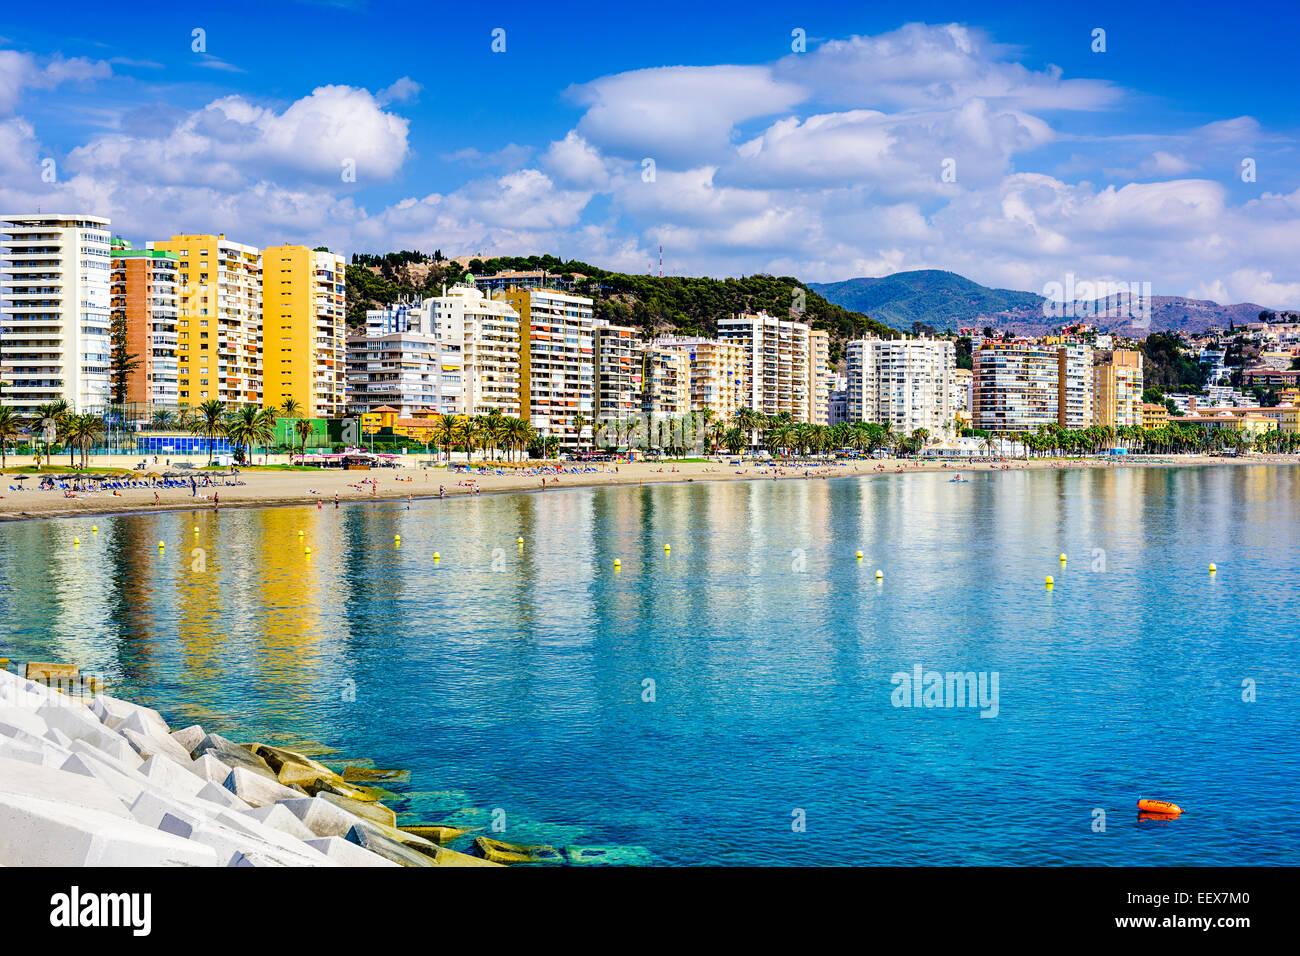 Malaga, Spanien am Strand Skyline bei Playa De La Malagueta. Stockbild